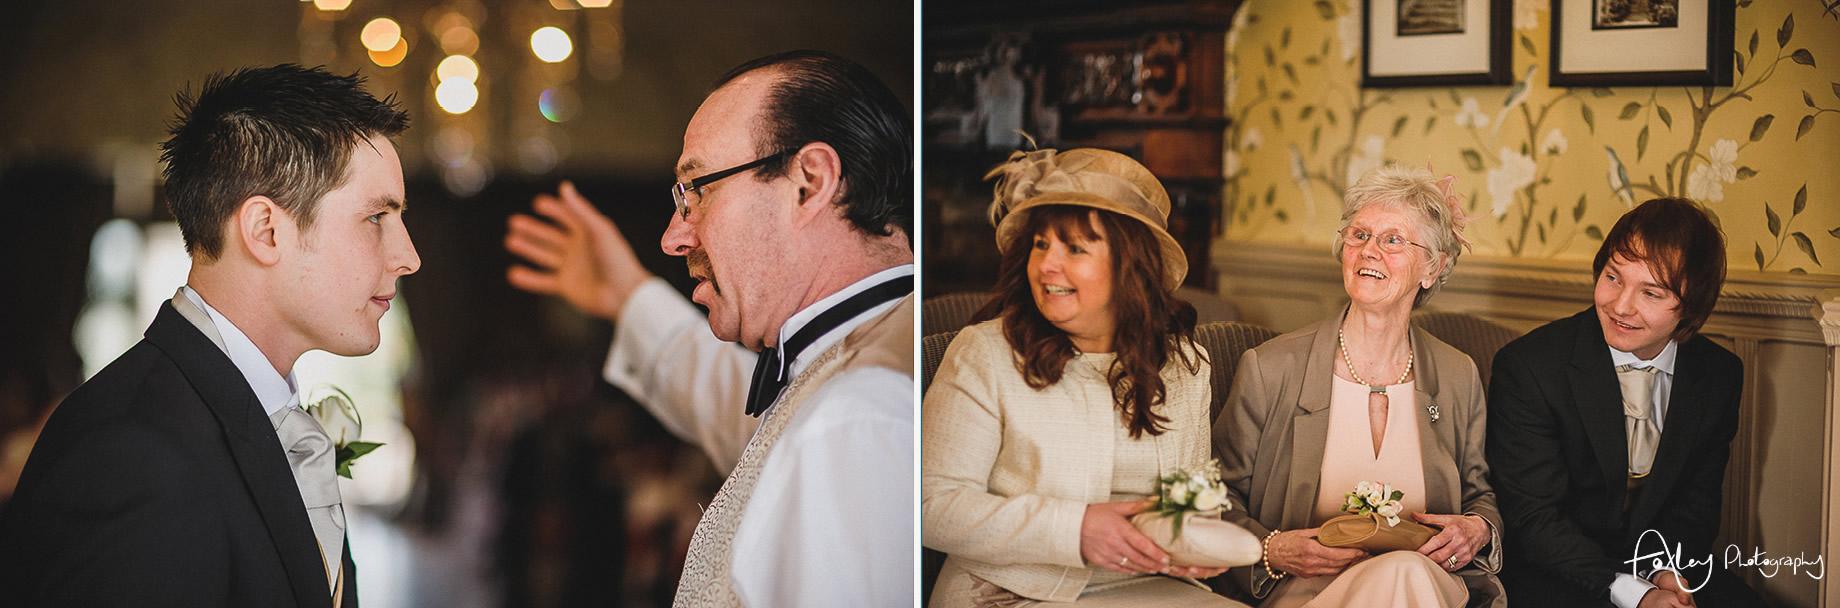 Gemma and Lewis' Wedding at Mitton Hall 066